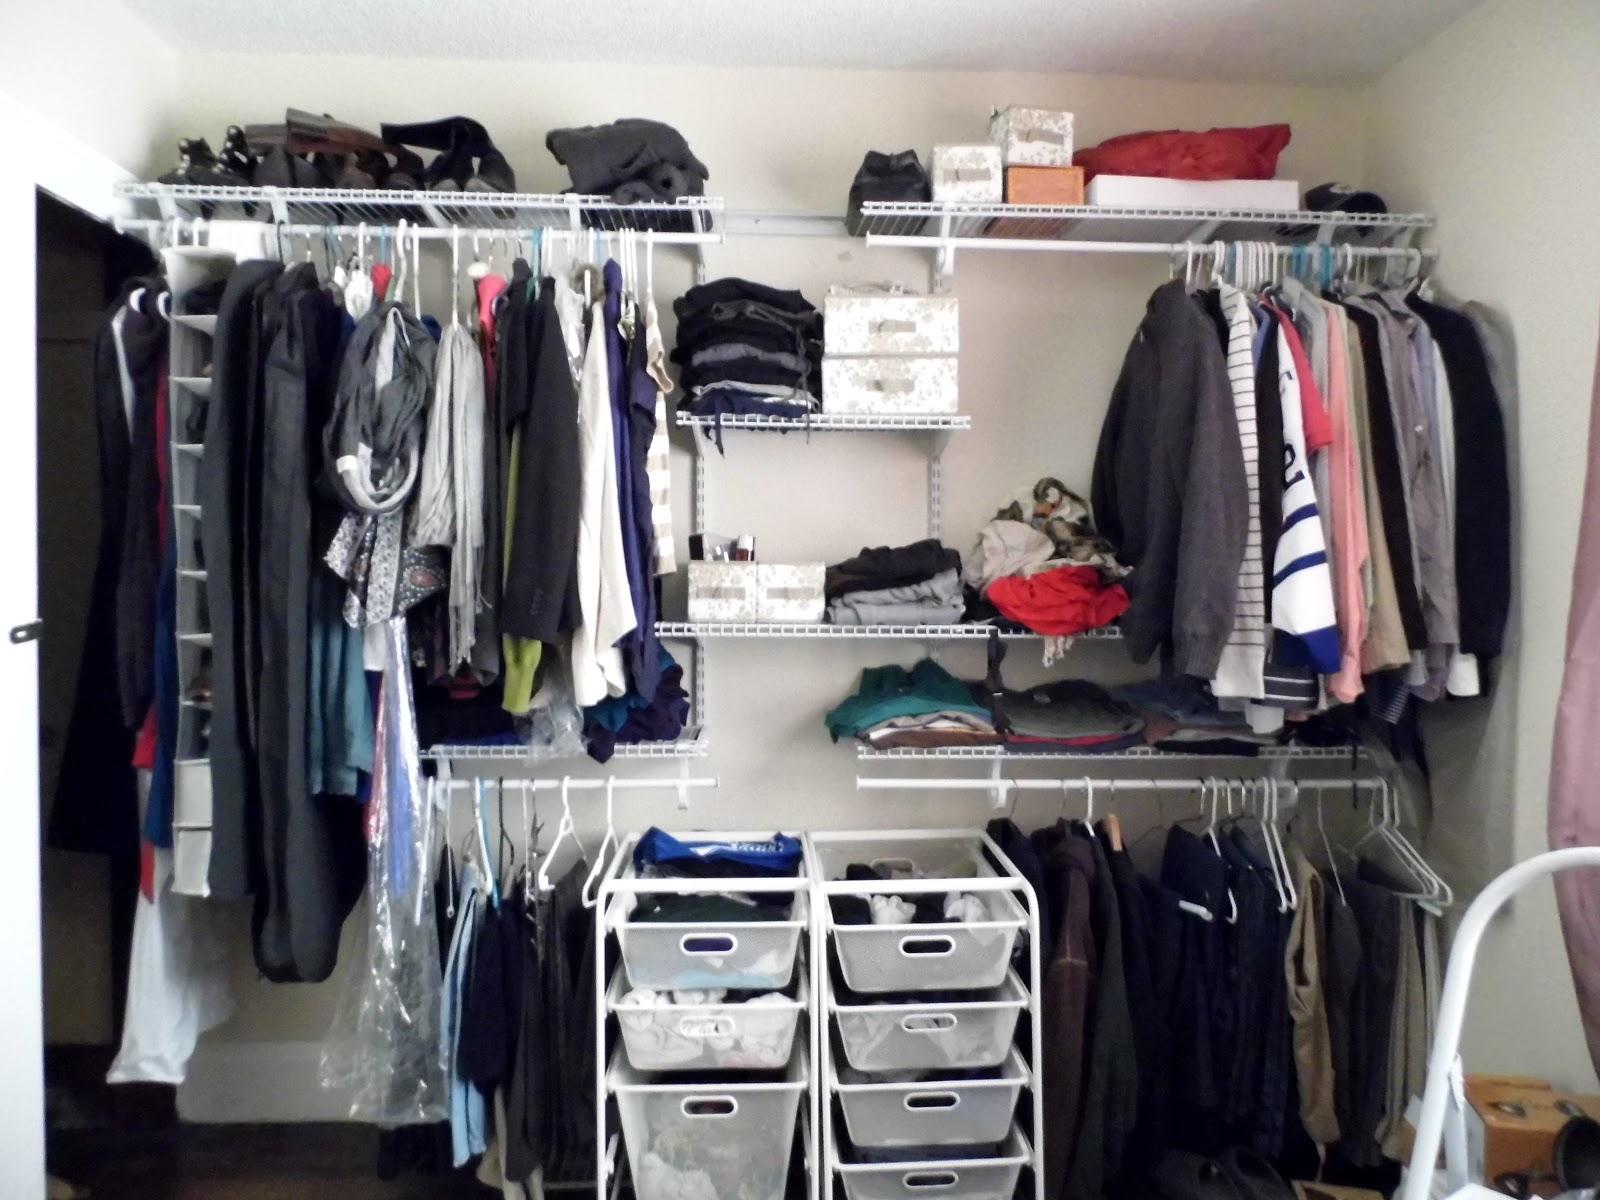 Ikea Hanging Closet Organizer S